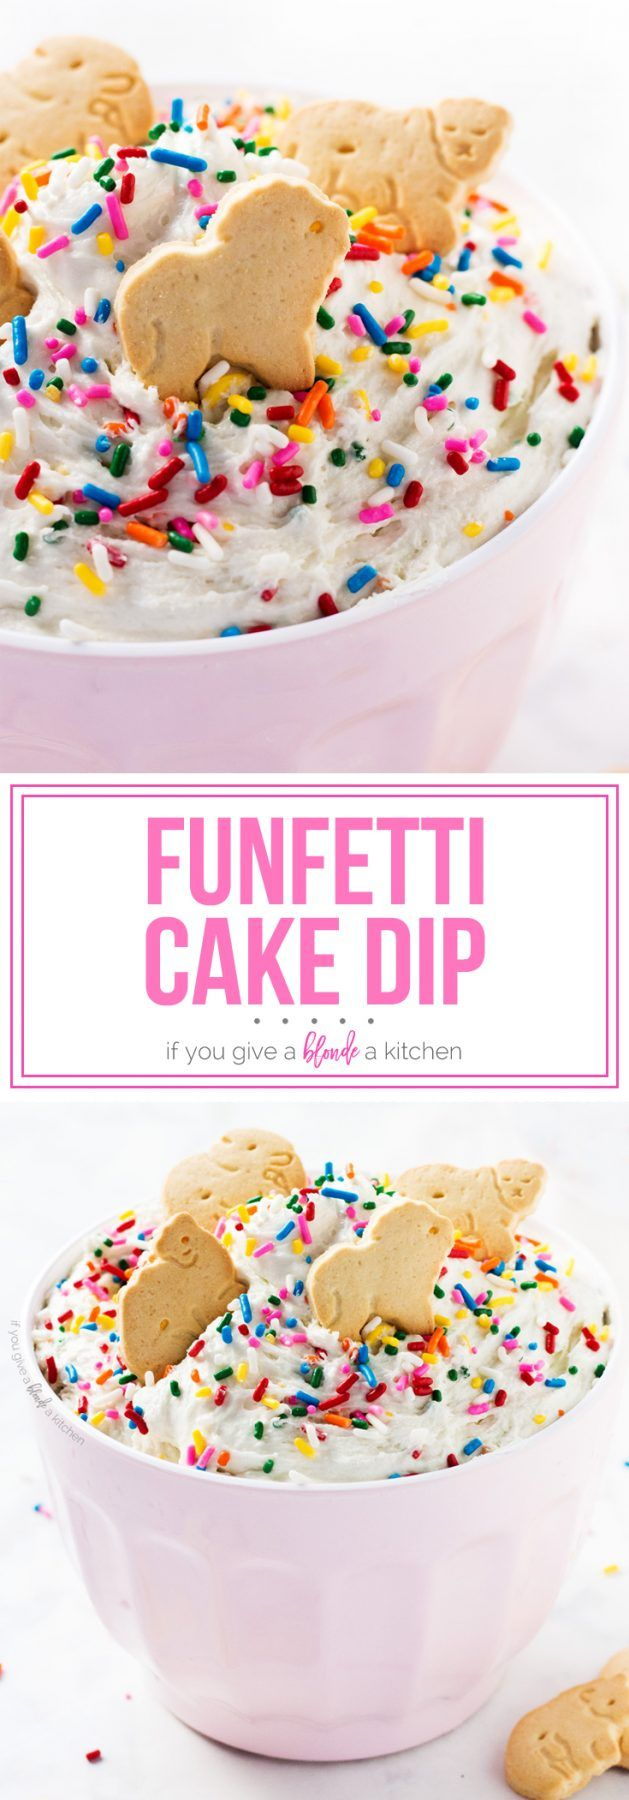 141 best recipes funfetti images on Pinterest Christmas baking